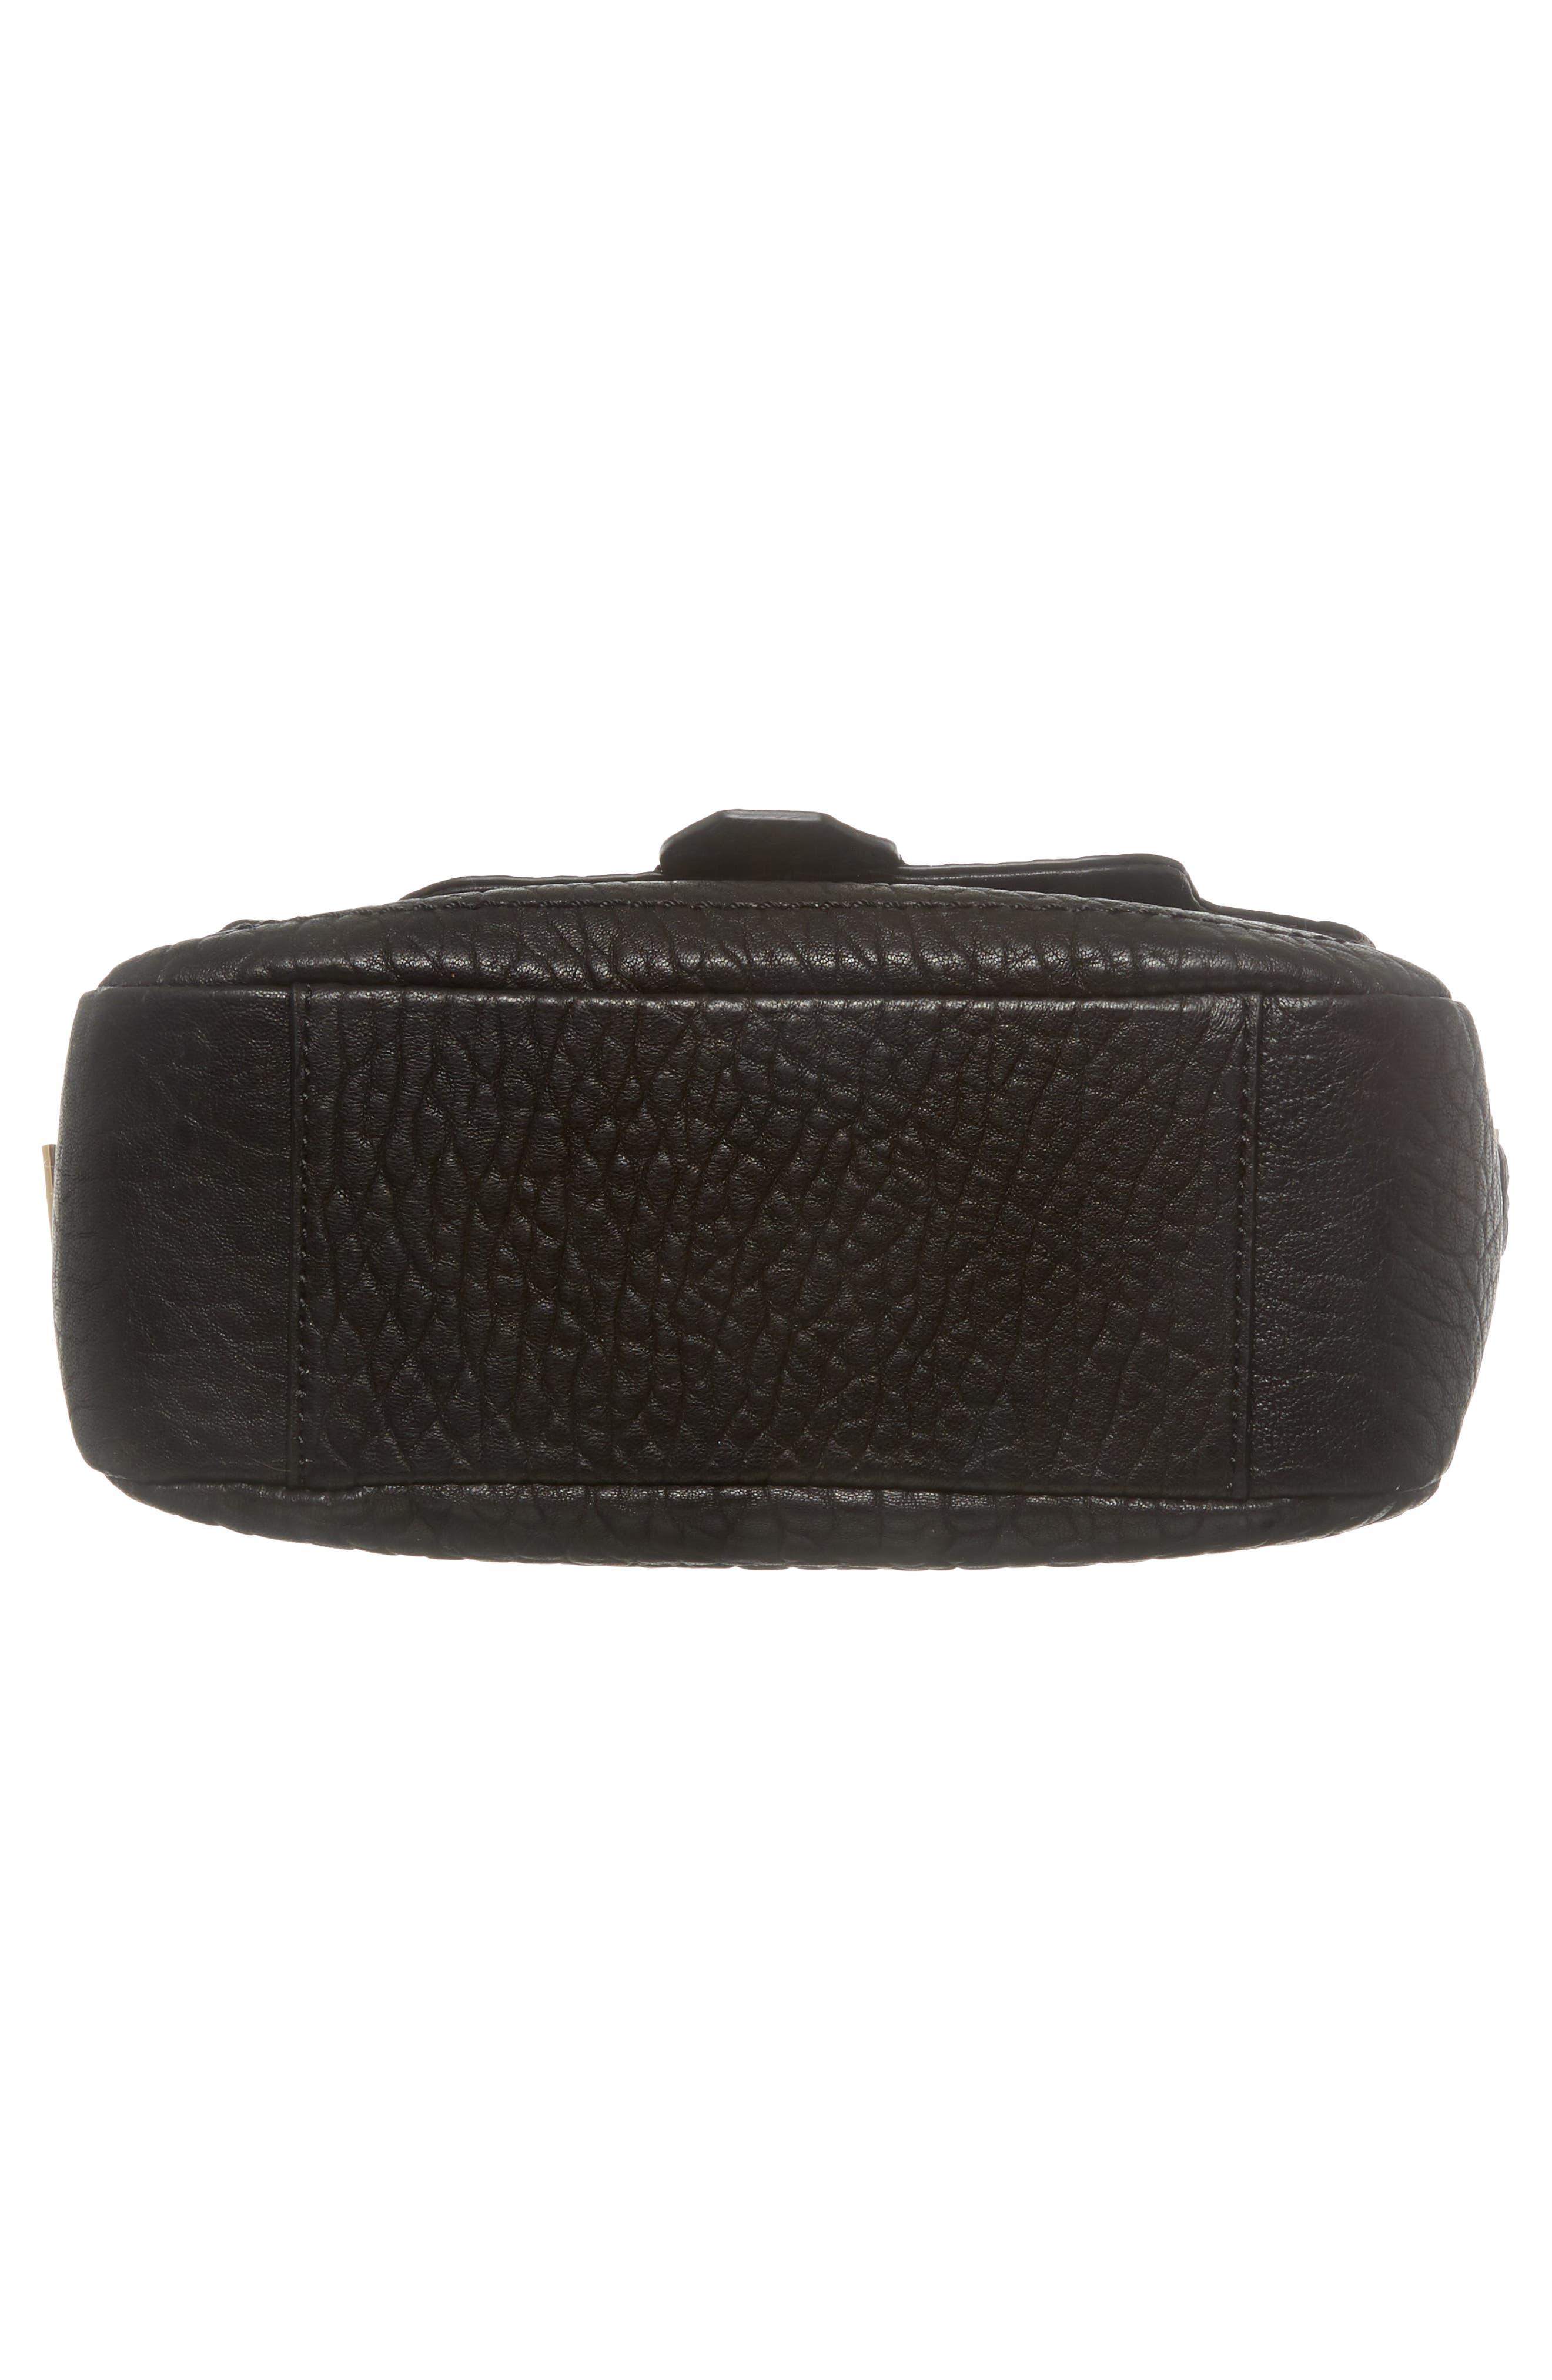 Fava Leather Crossbody Bag,                             Alternate thumbnail 6, color,                             001